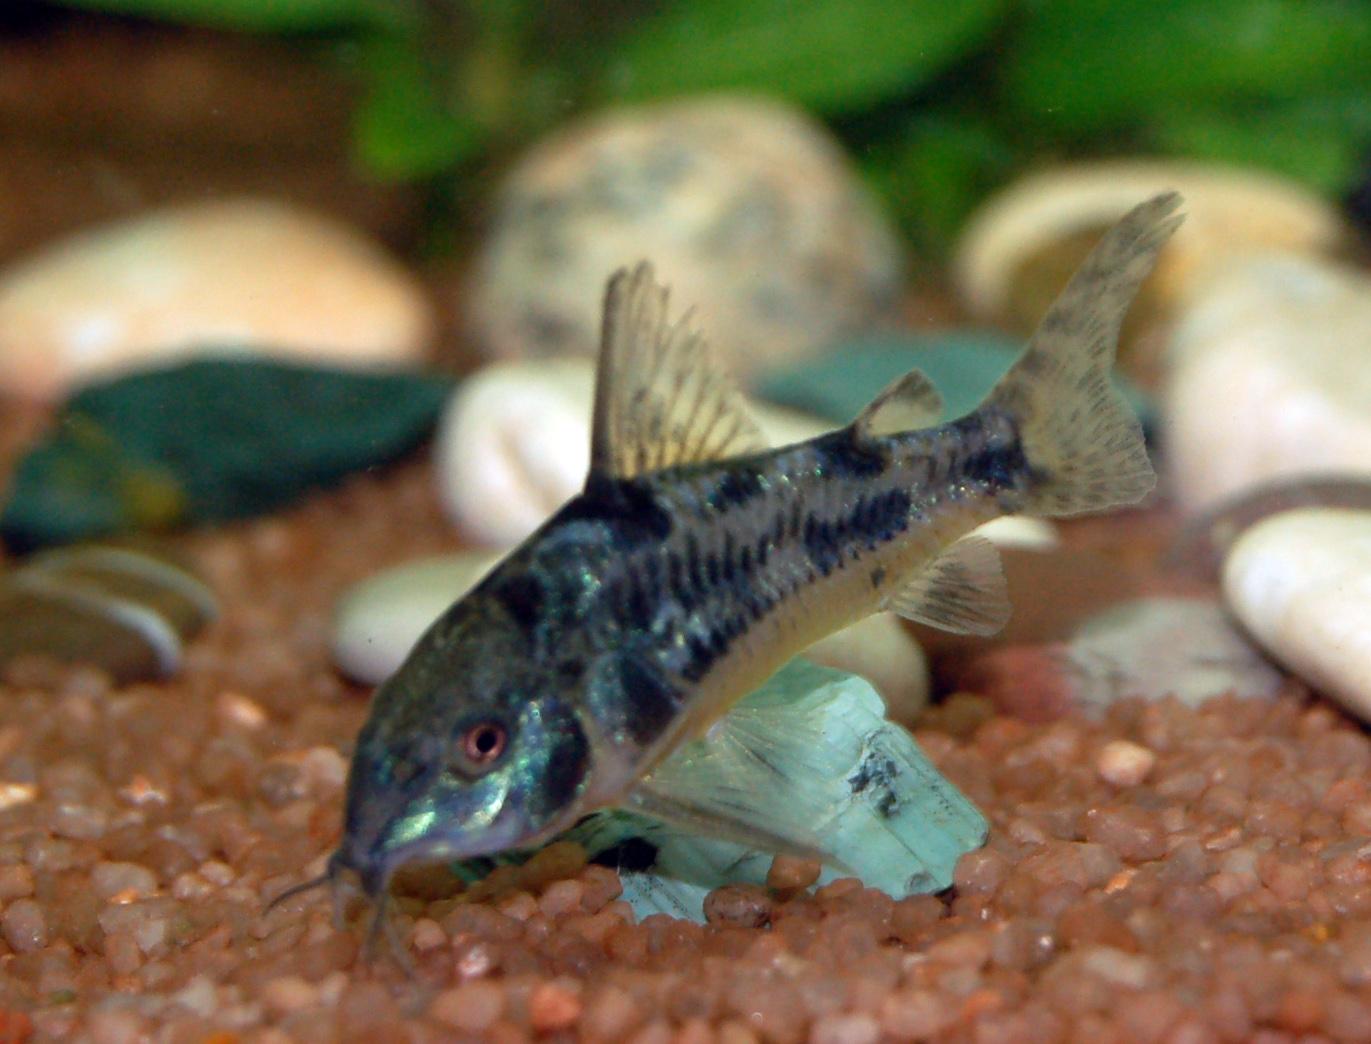 File:Corydoras paleatus matt.jpg - Wikimedia Commons